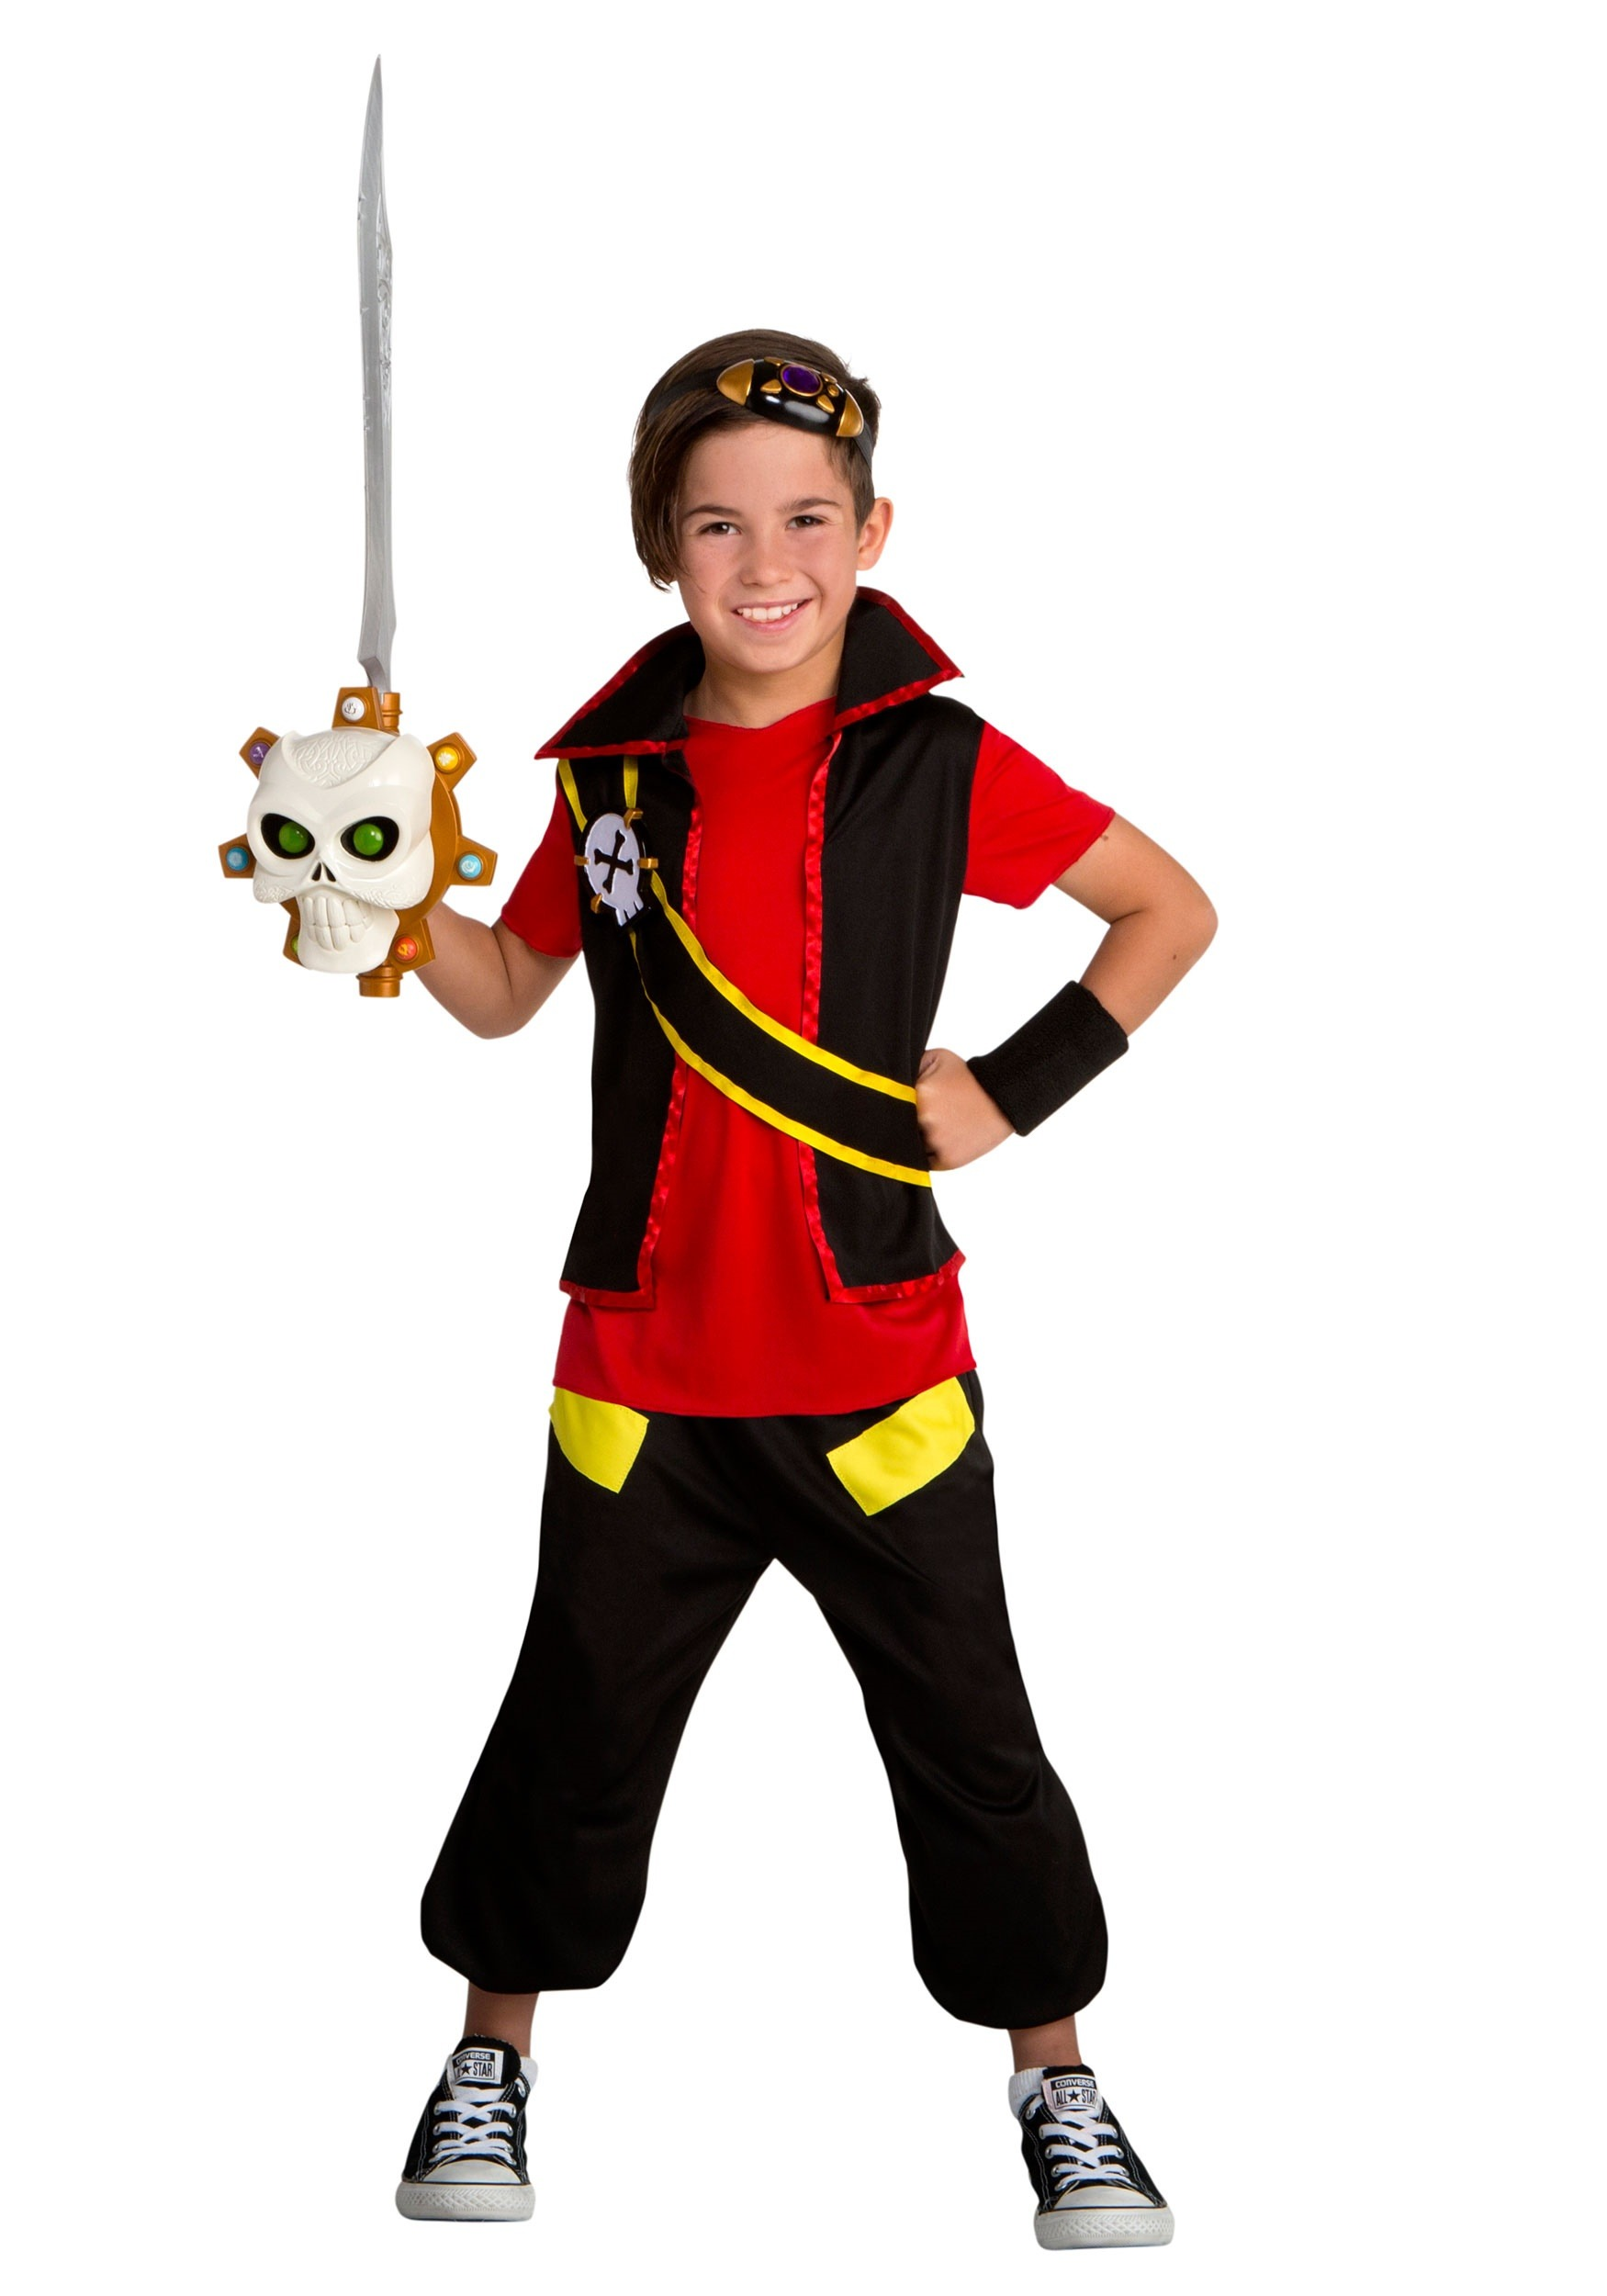 Zak Storm Boys Zak Costume  sc 1 st  Halloween Costumes & Zak Storm Zak Costume for Boys